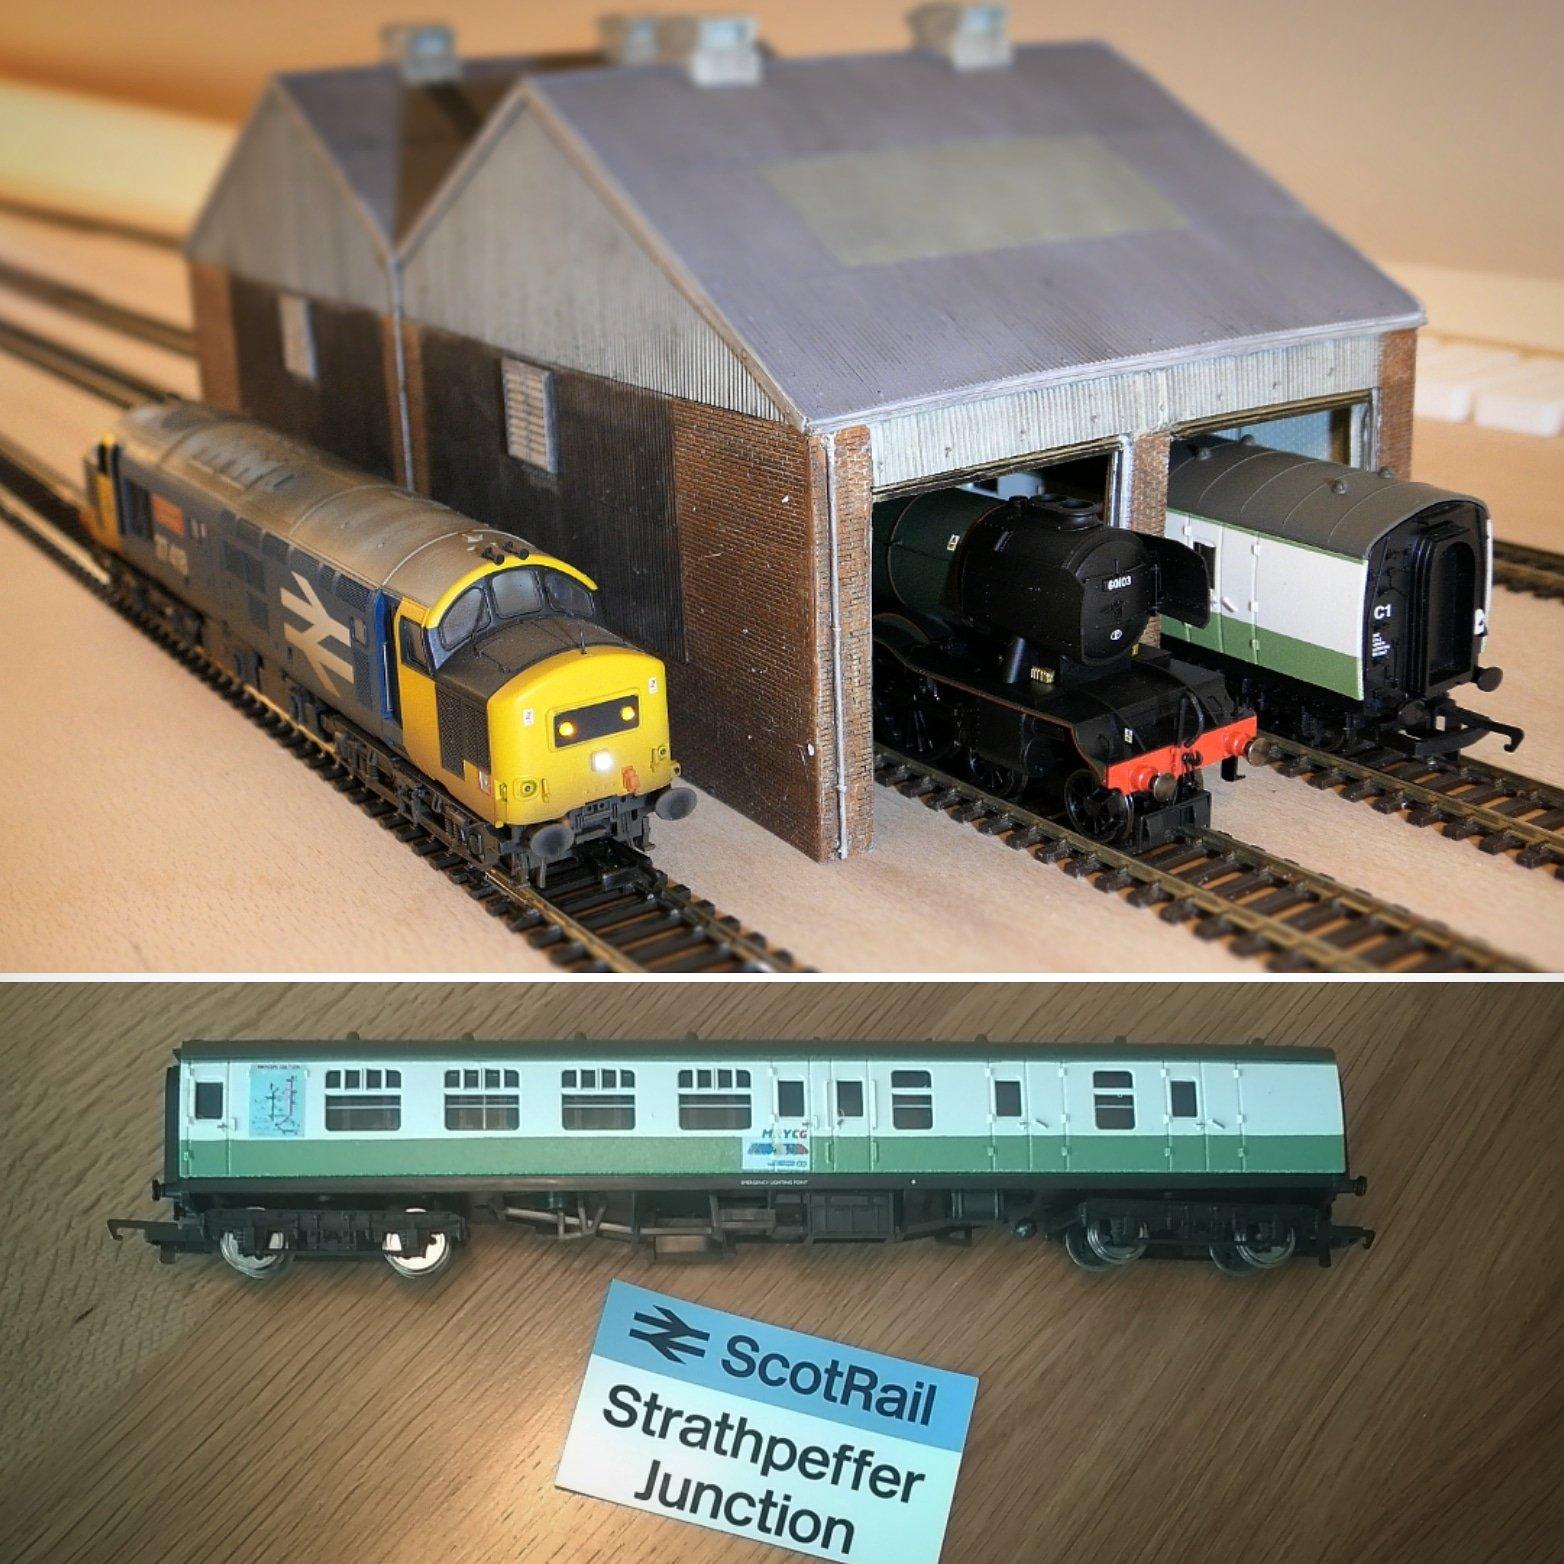 Model Railway Youtube Community Group Archives - Strathpeffer Junction